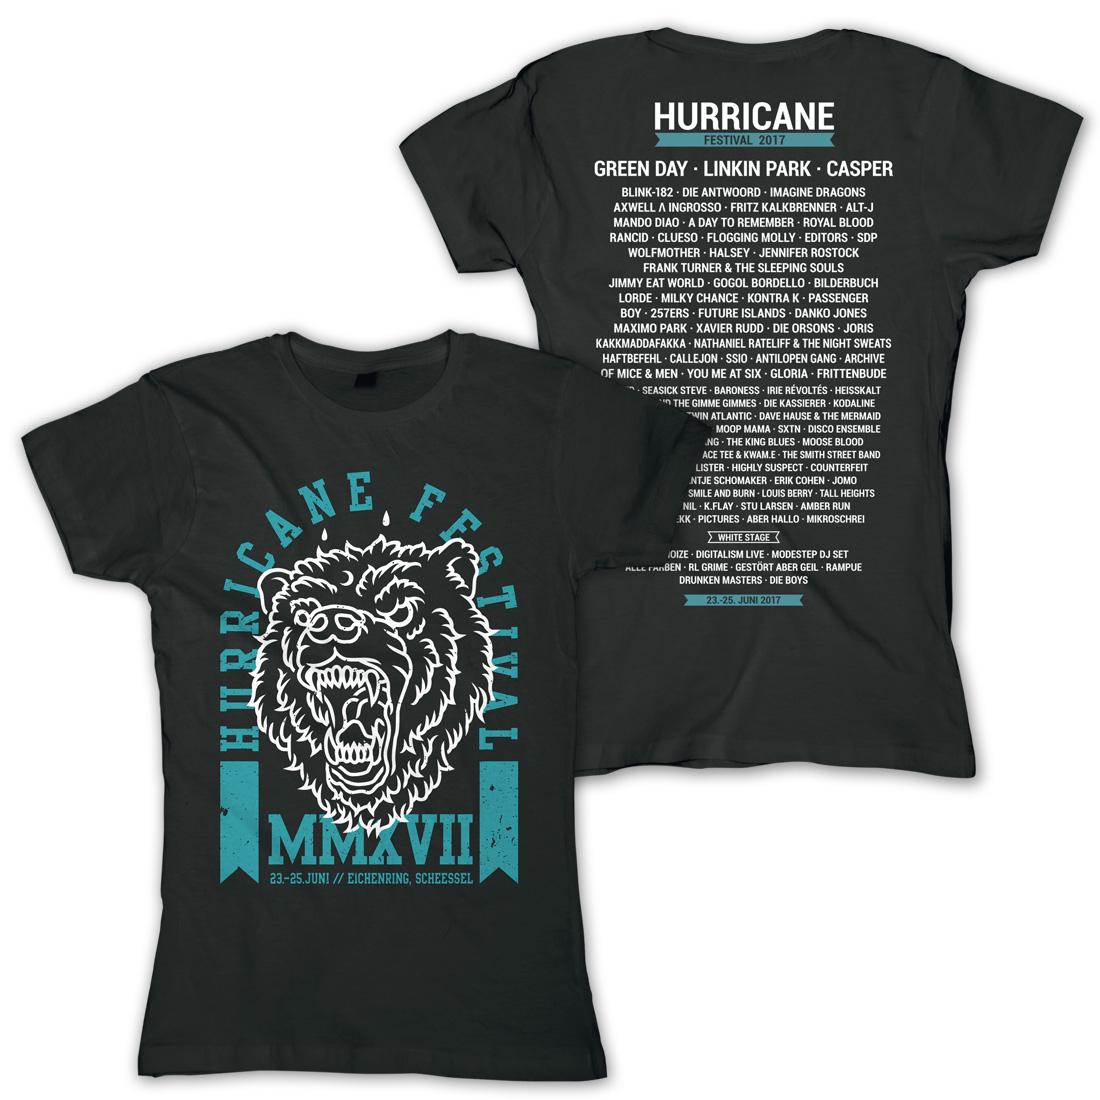 Festivalmerchandise im Sale - Hurricane, Southside, Rock am Ring uvm